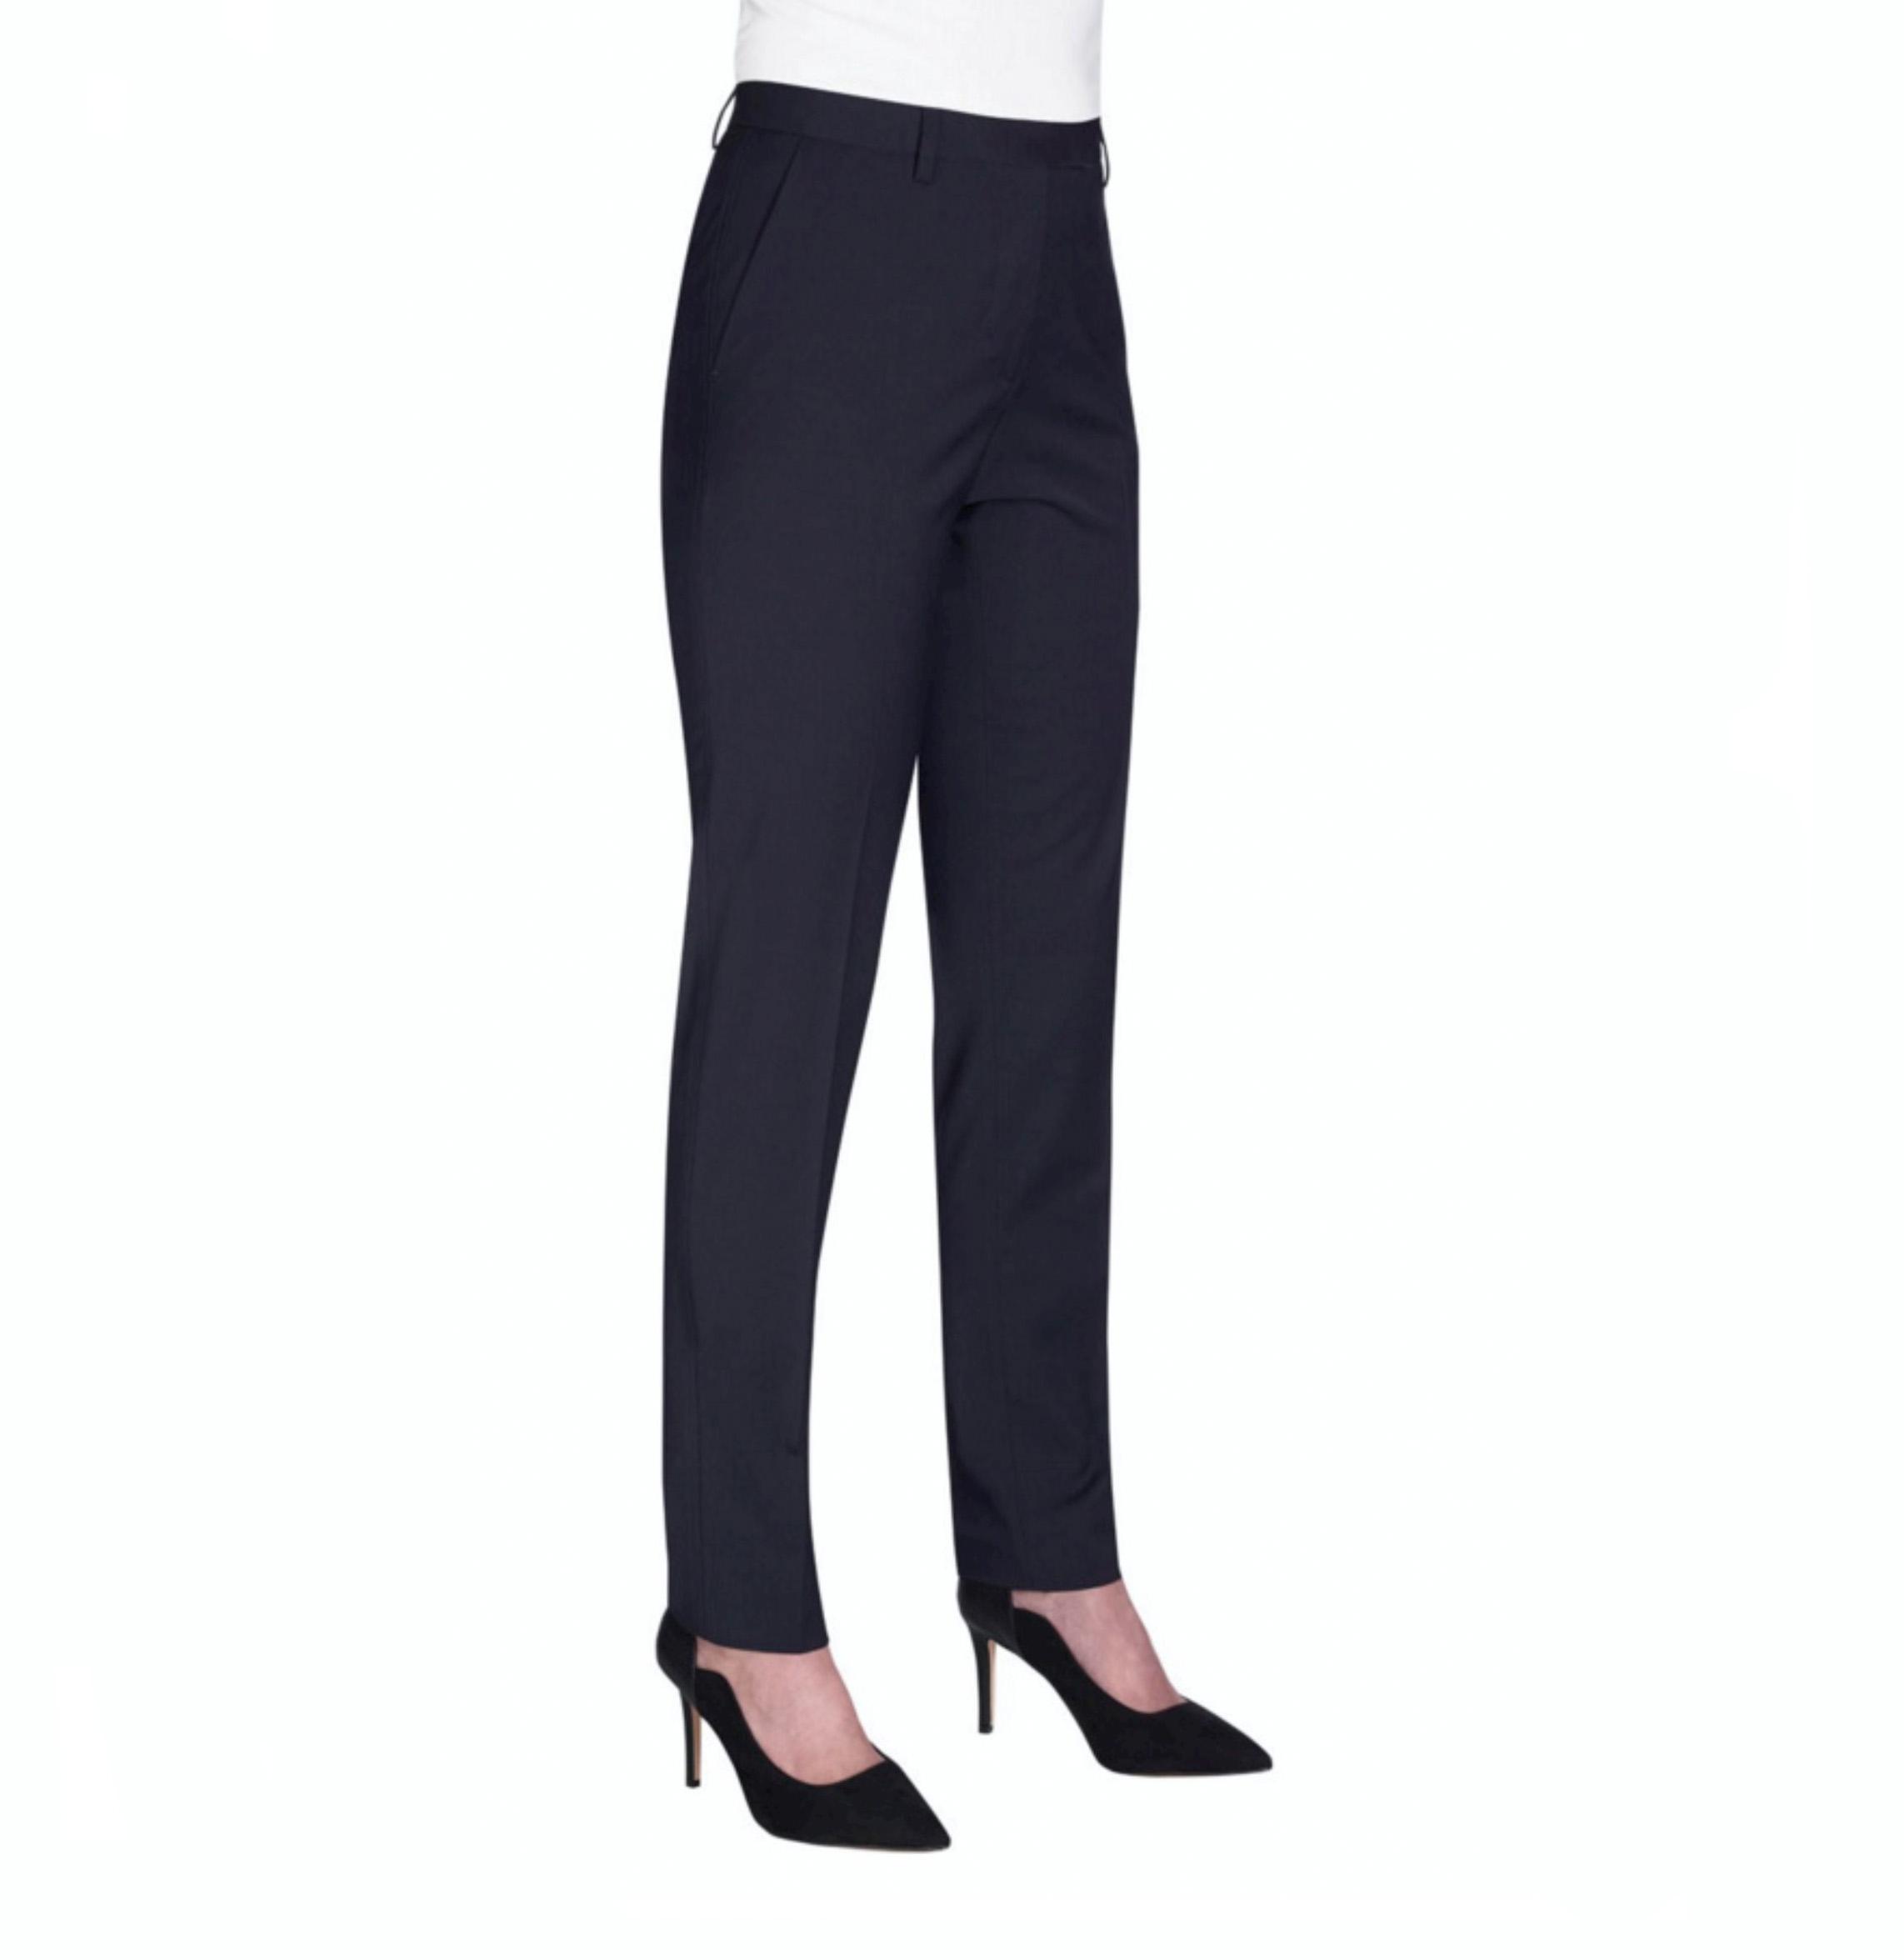 Torino pantalone (D)